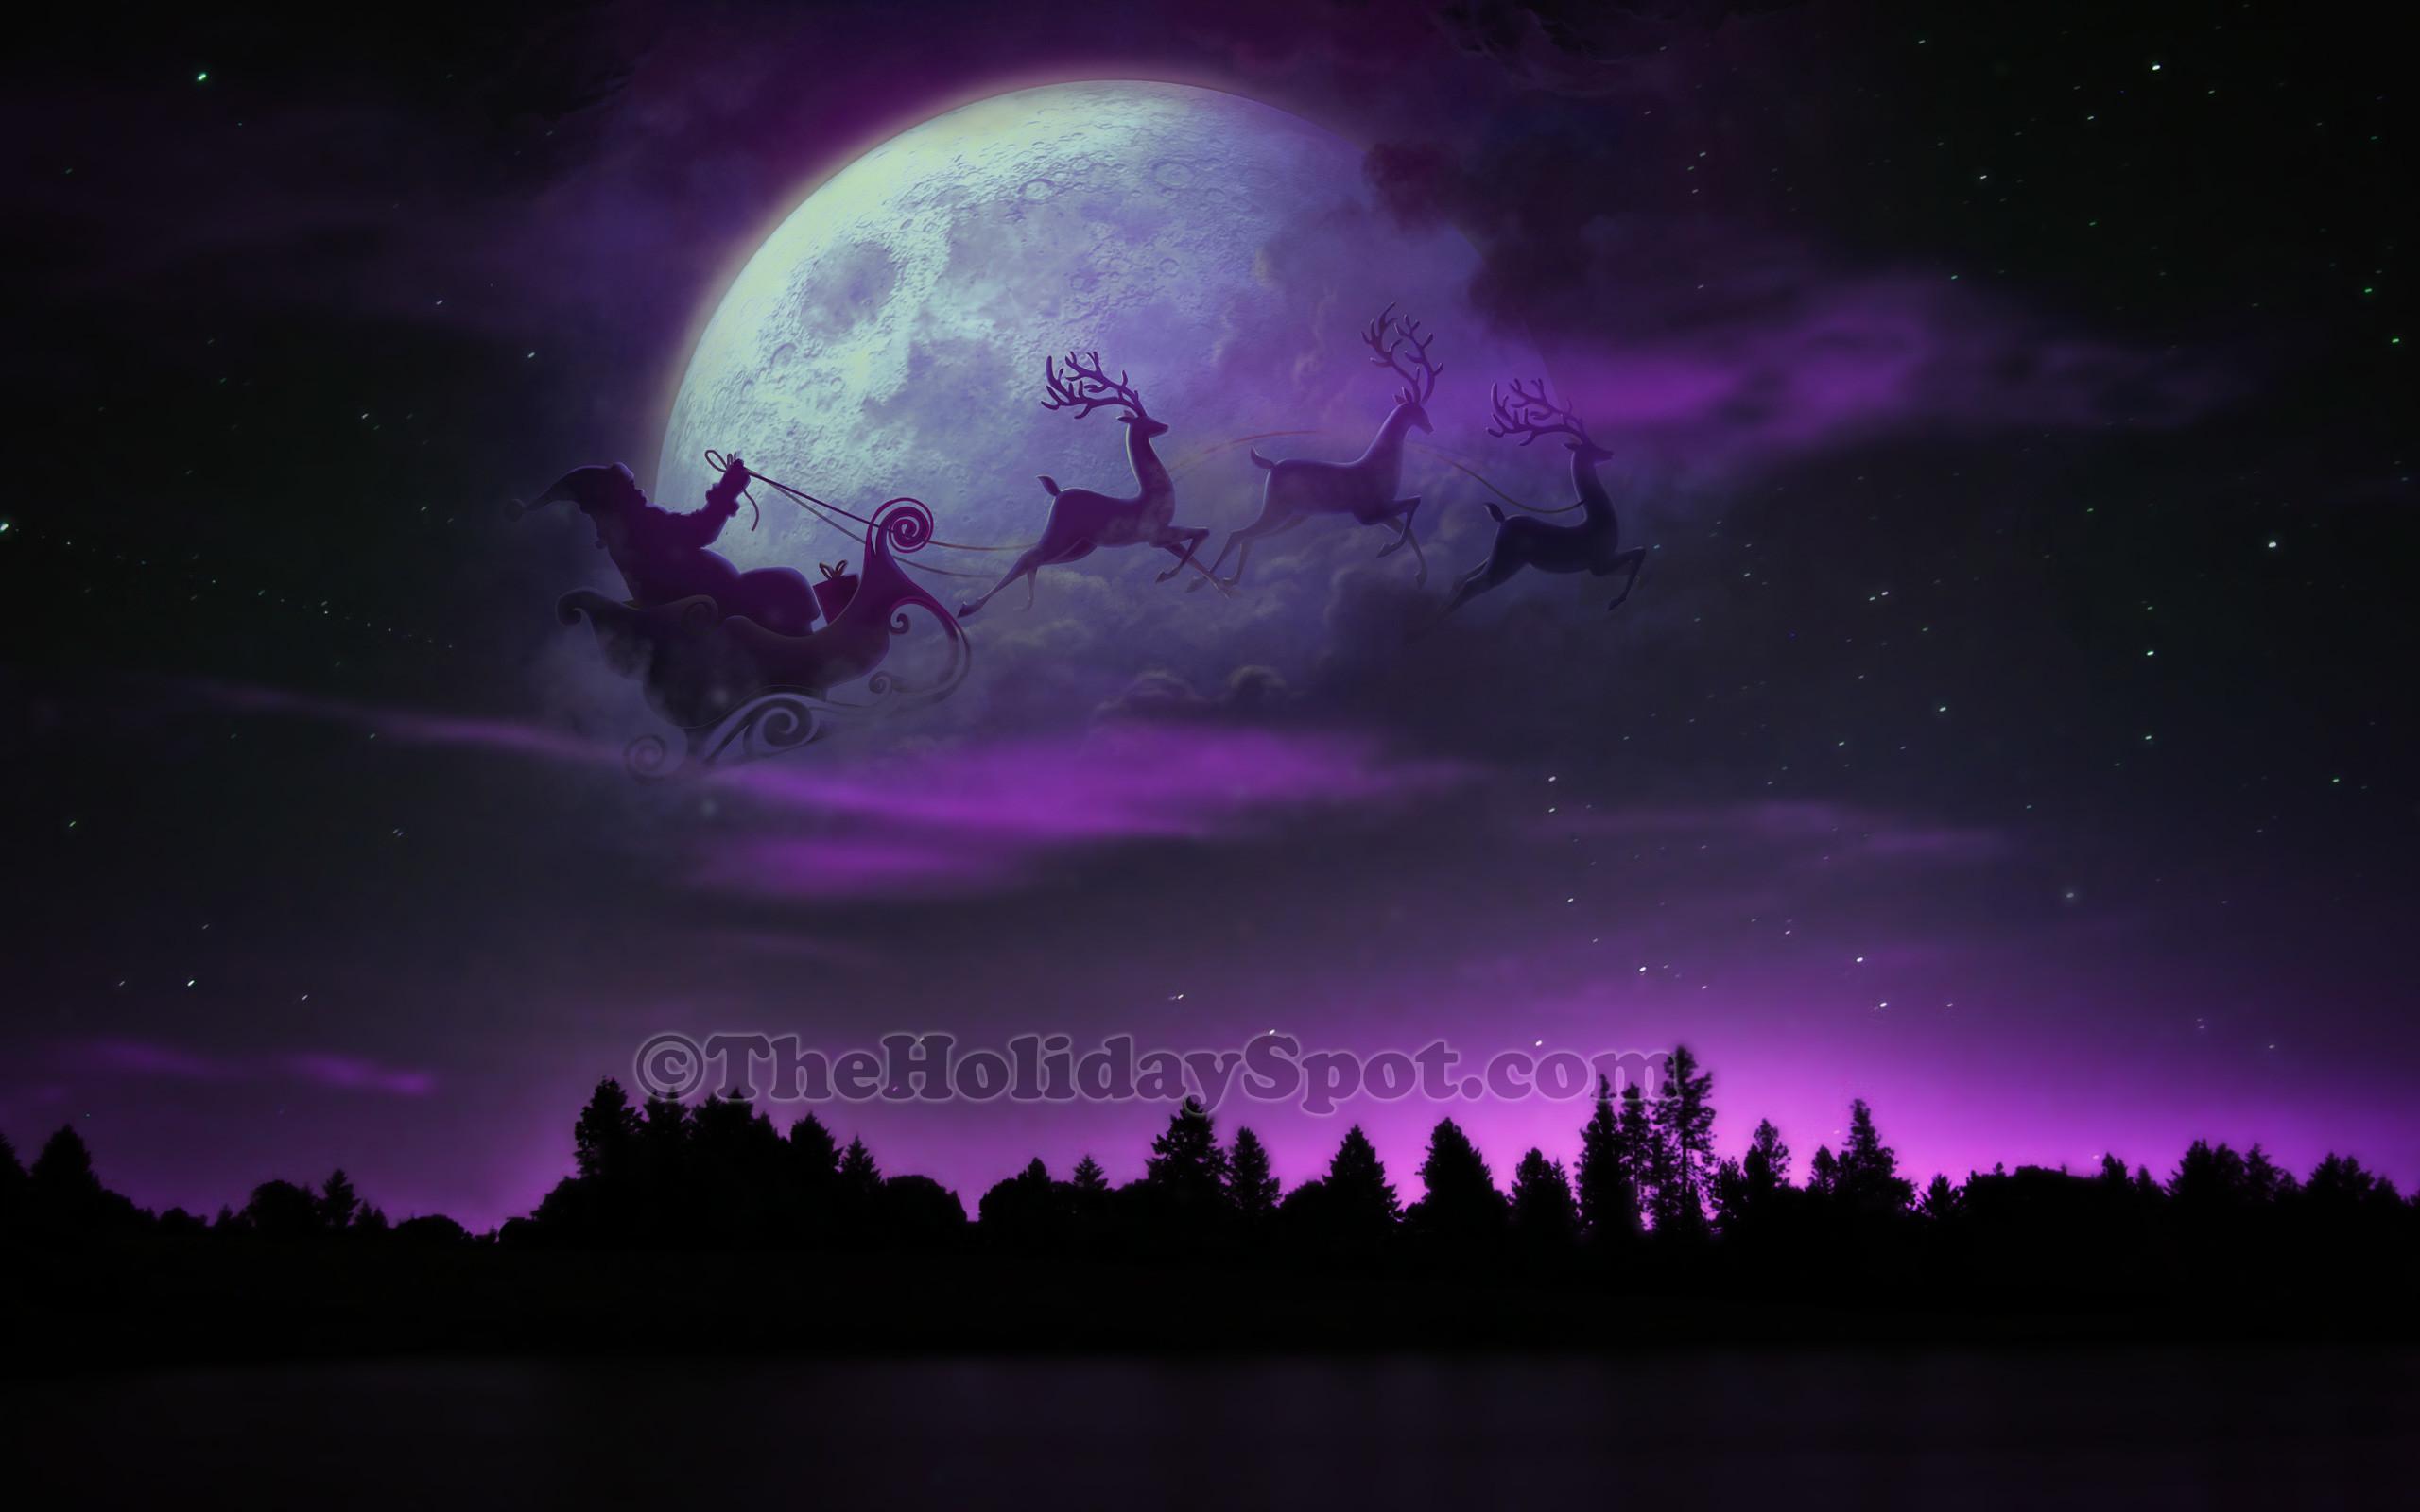 Outdoor Christmas Lights Reindeer And Sleigh